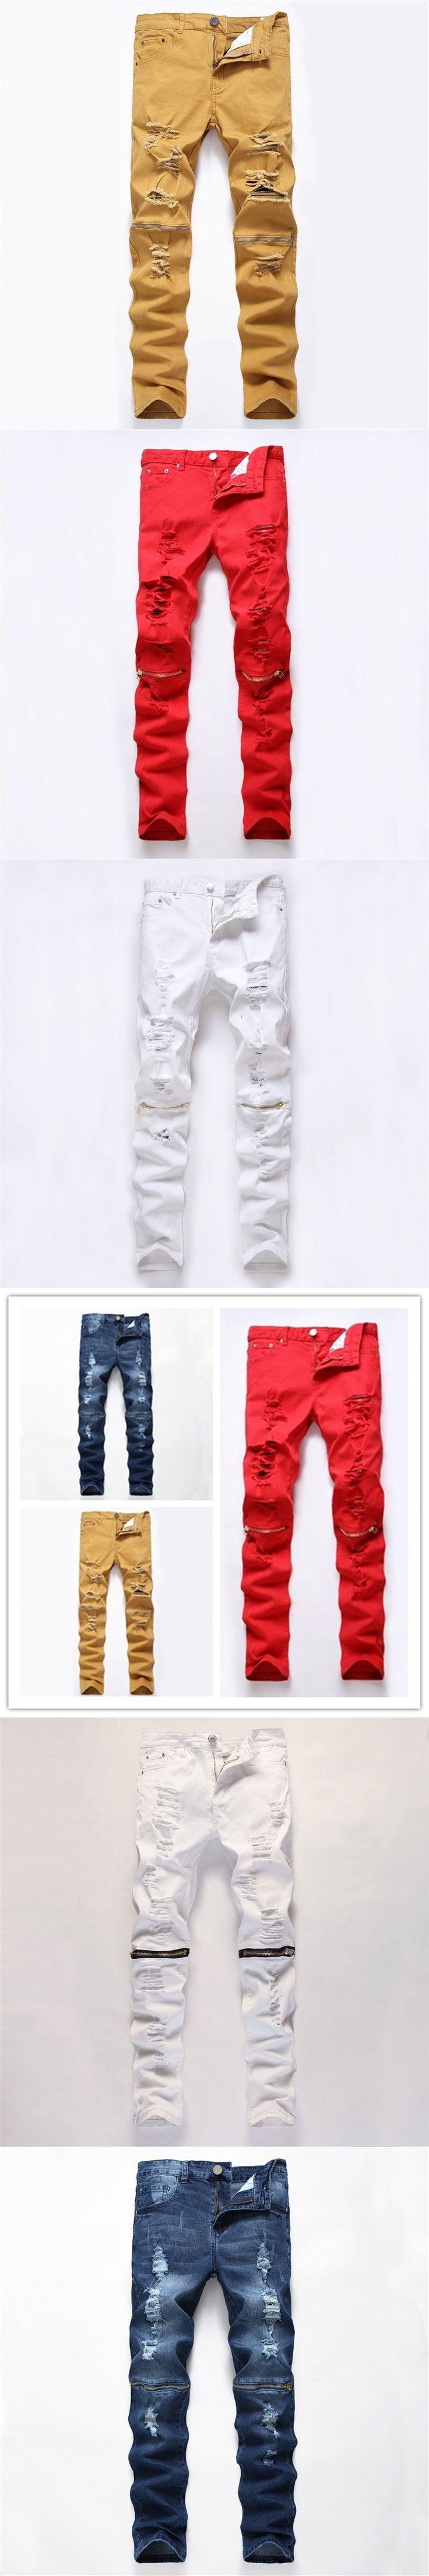 New Fashion Mens Ripped Biker Jeans Men 100% Cotton Red Black White Blue Khaki Slim Fit Rock Motorcycle Jeans Men's Skinny Pants